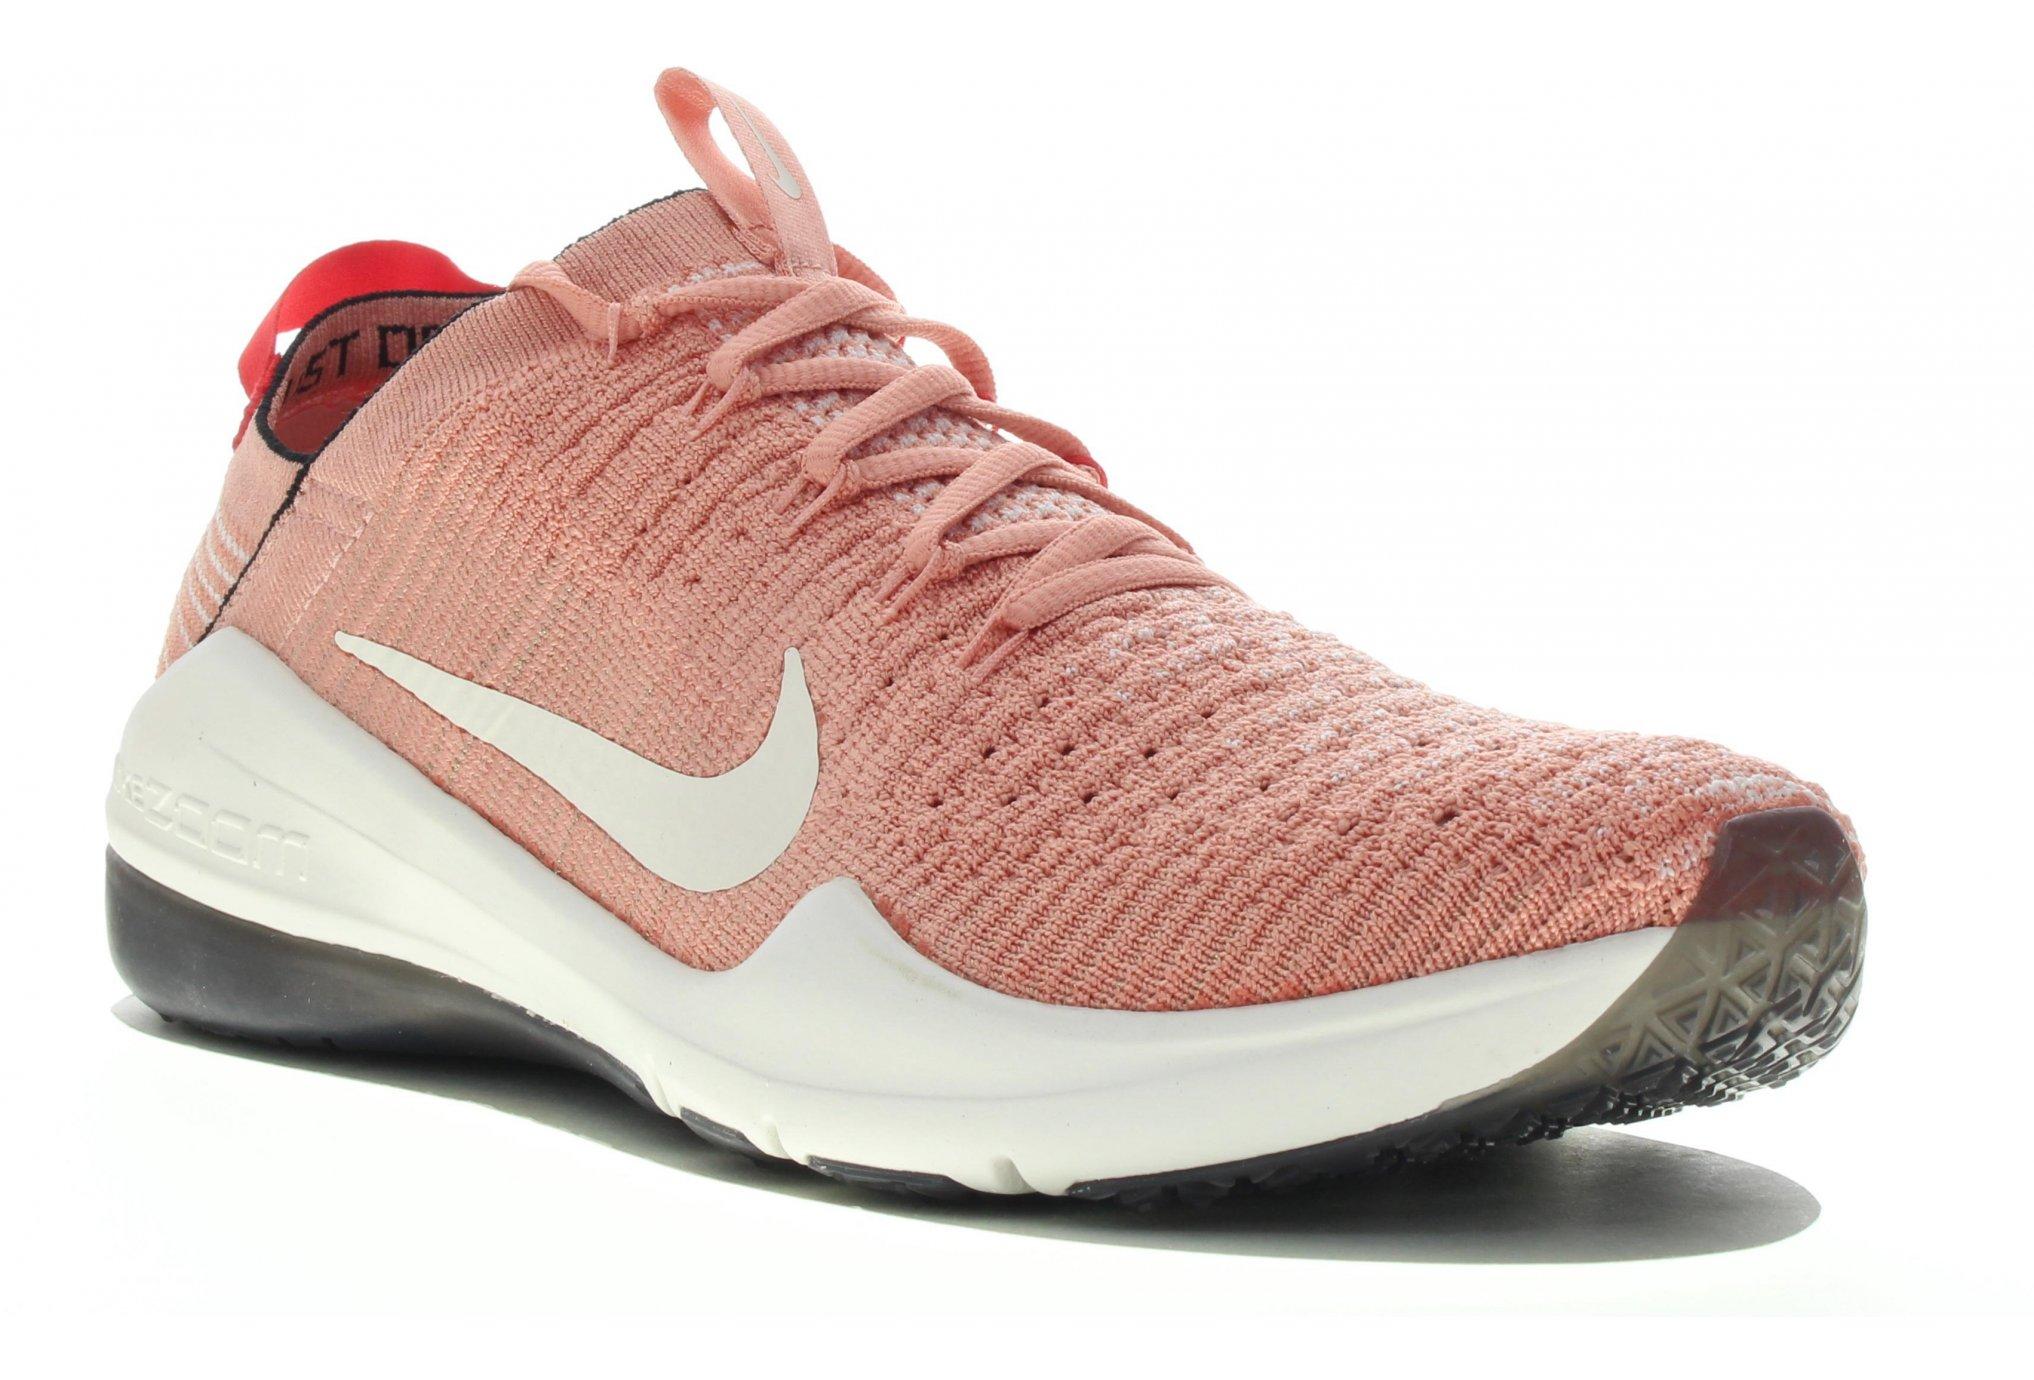 Nike Air Zoom Fearless Flyknit 2 W Diététique Chaussures femme